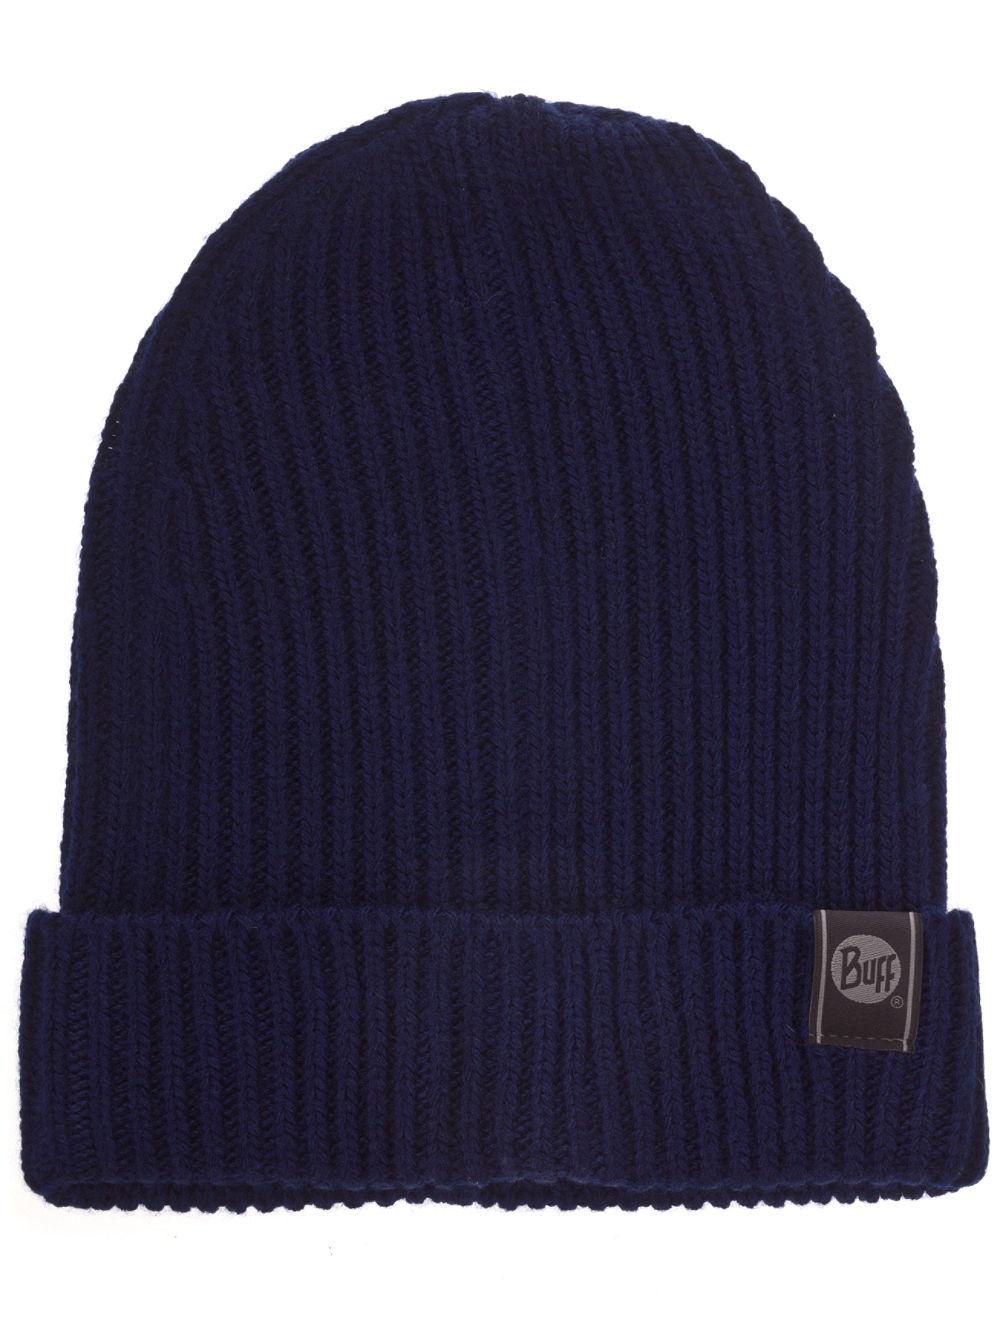 knitted-buff-basic-beanie